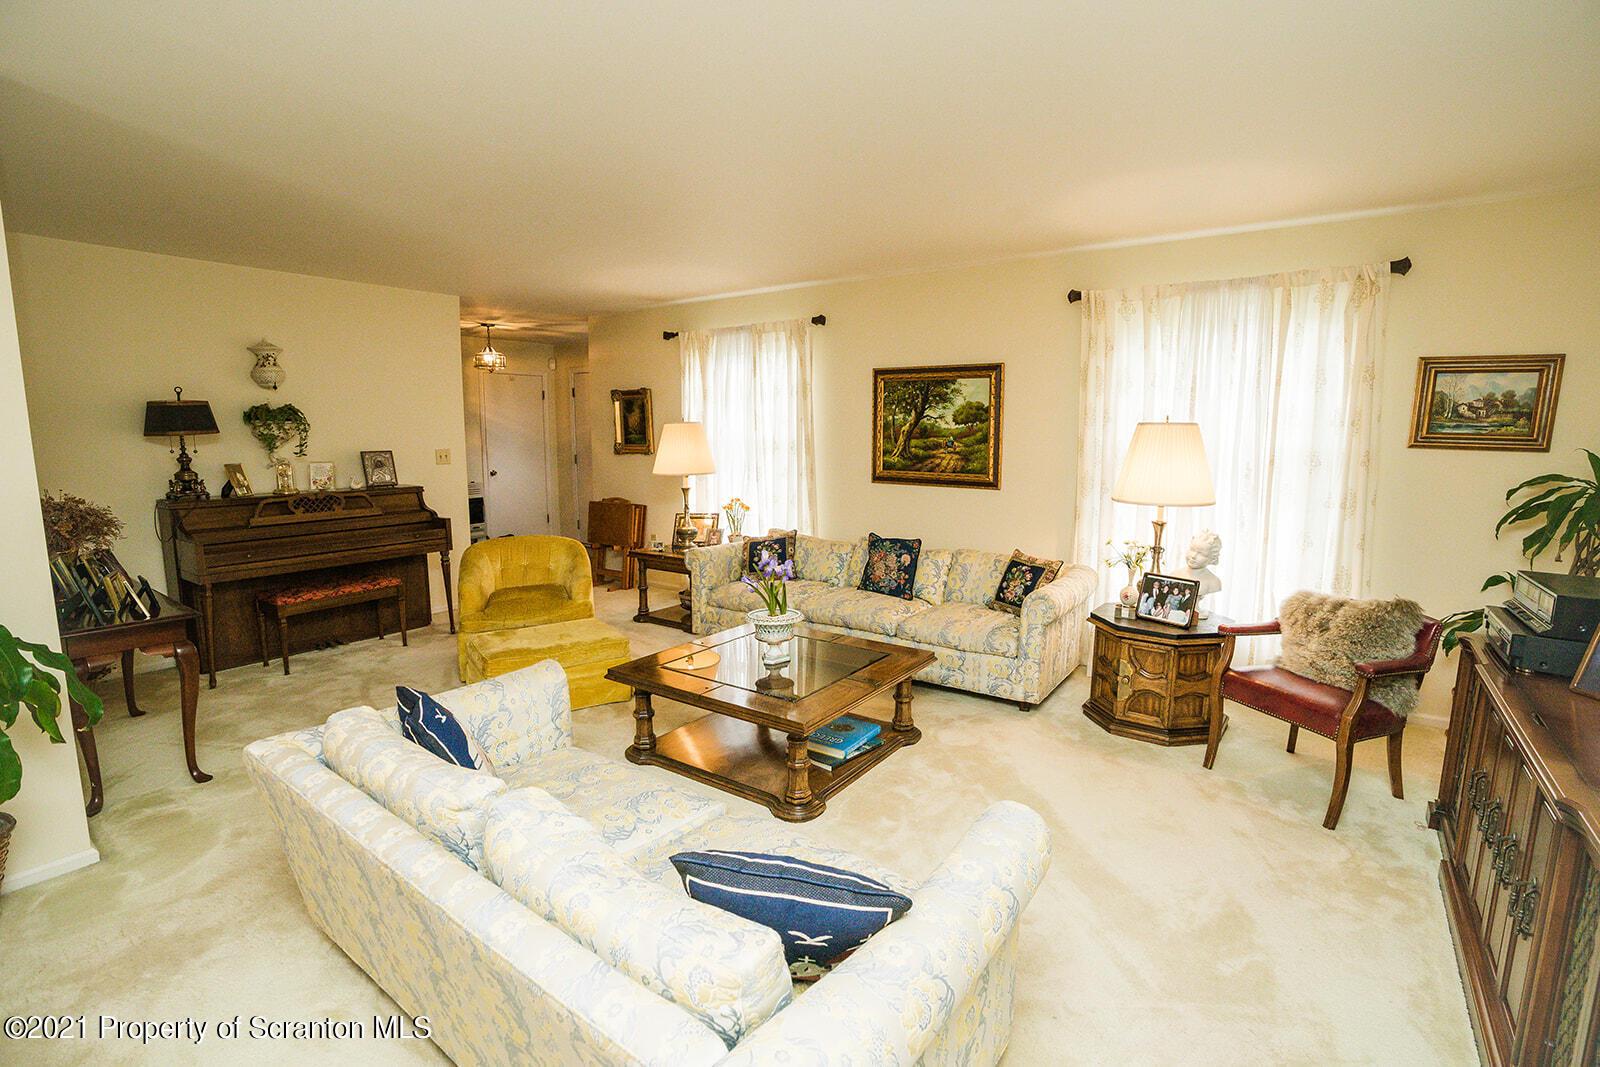 822 Laconia Cir, Clarks Summit, Pennsylvania 18411, 3 Bedrooms Bedrooms, 7 Rooms Rooms,3 BathroomsBathrooms,Single Family,For Sale,Laconia,21-3131